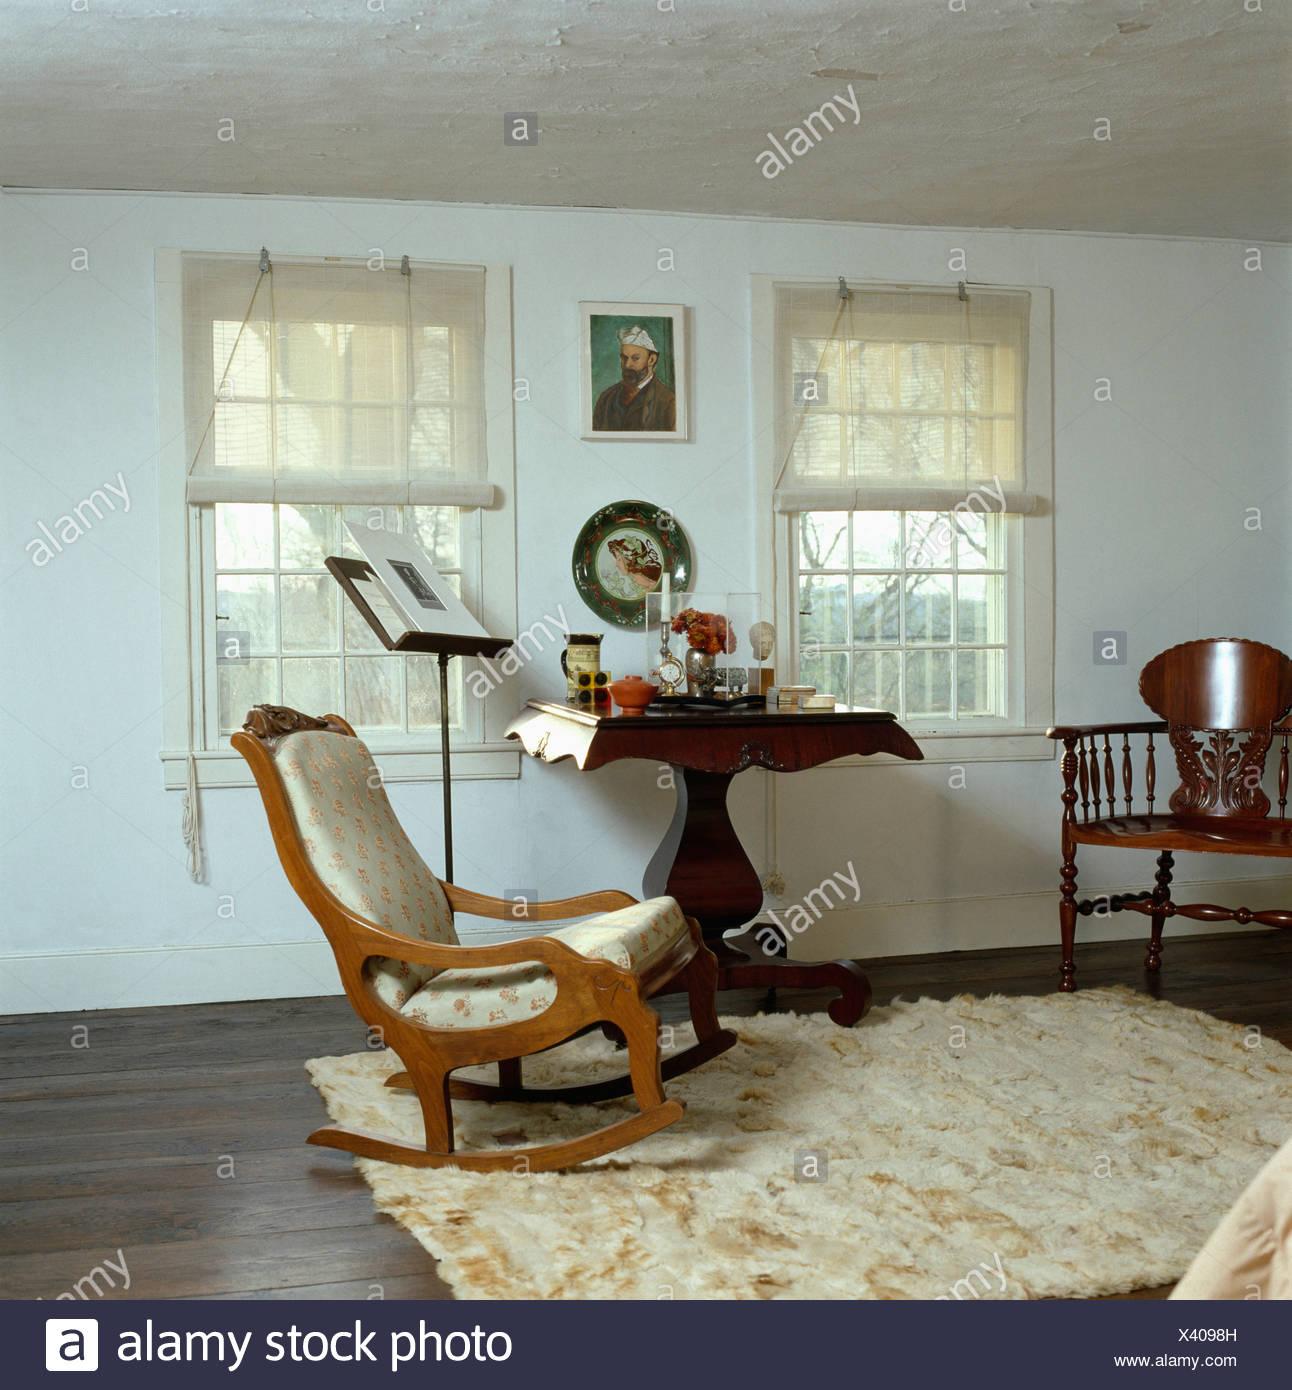 Incredible Cream Ponyskin Rug On Dark Wood Floor In White Bedroom With Spiritservingveterans Wood Chair Design Ideas Spiritservingveteransorg